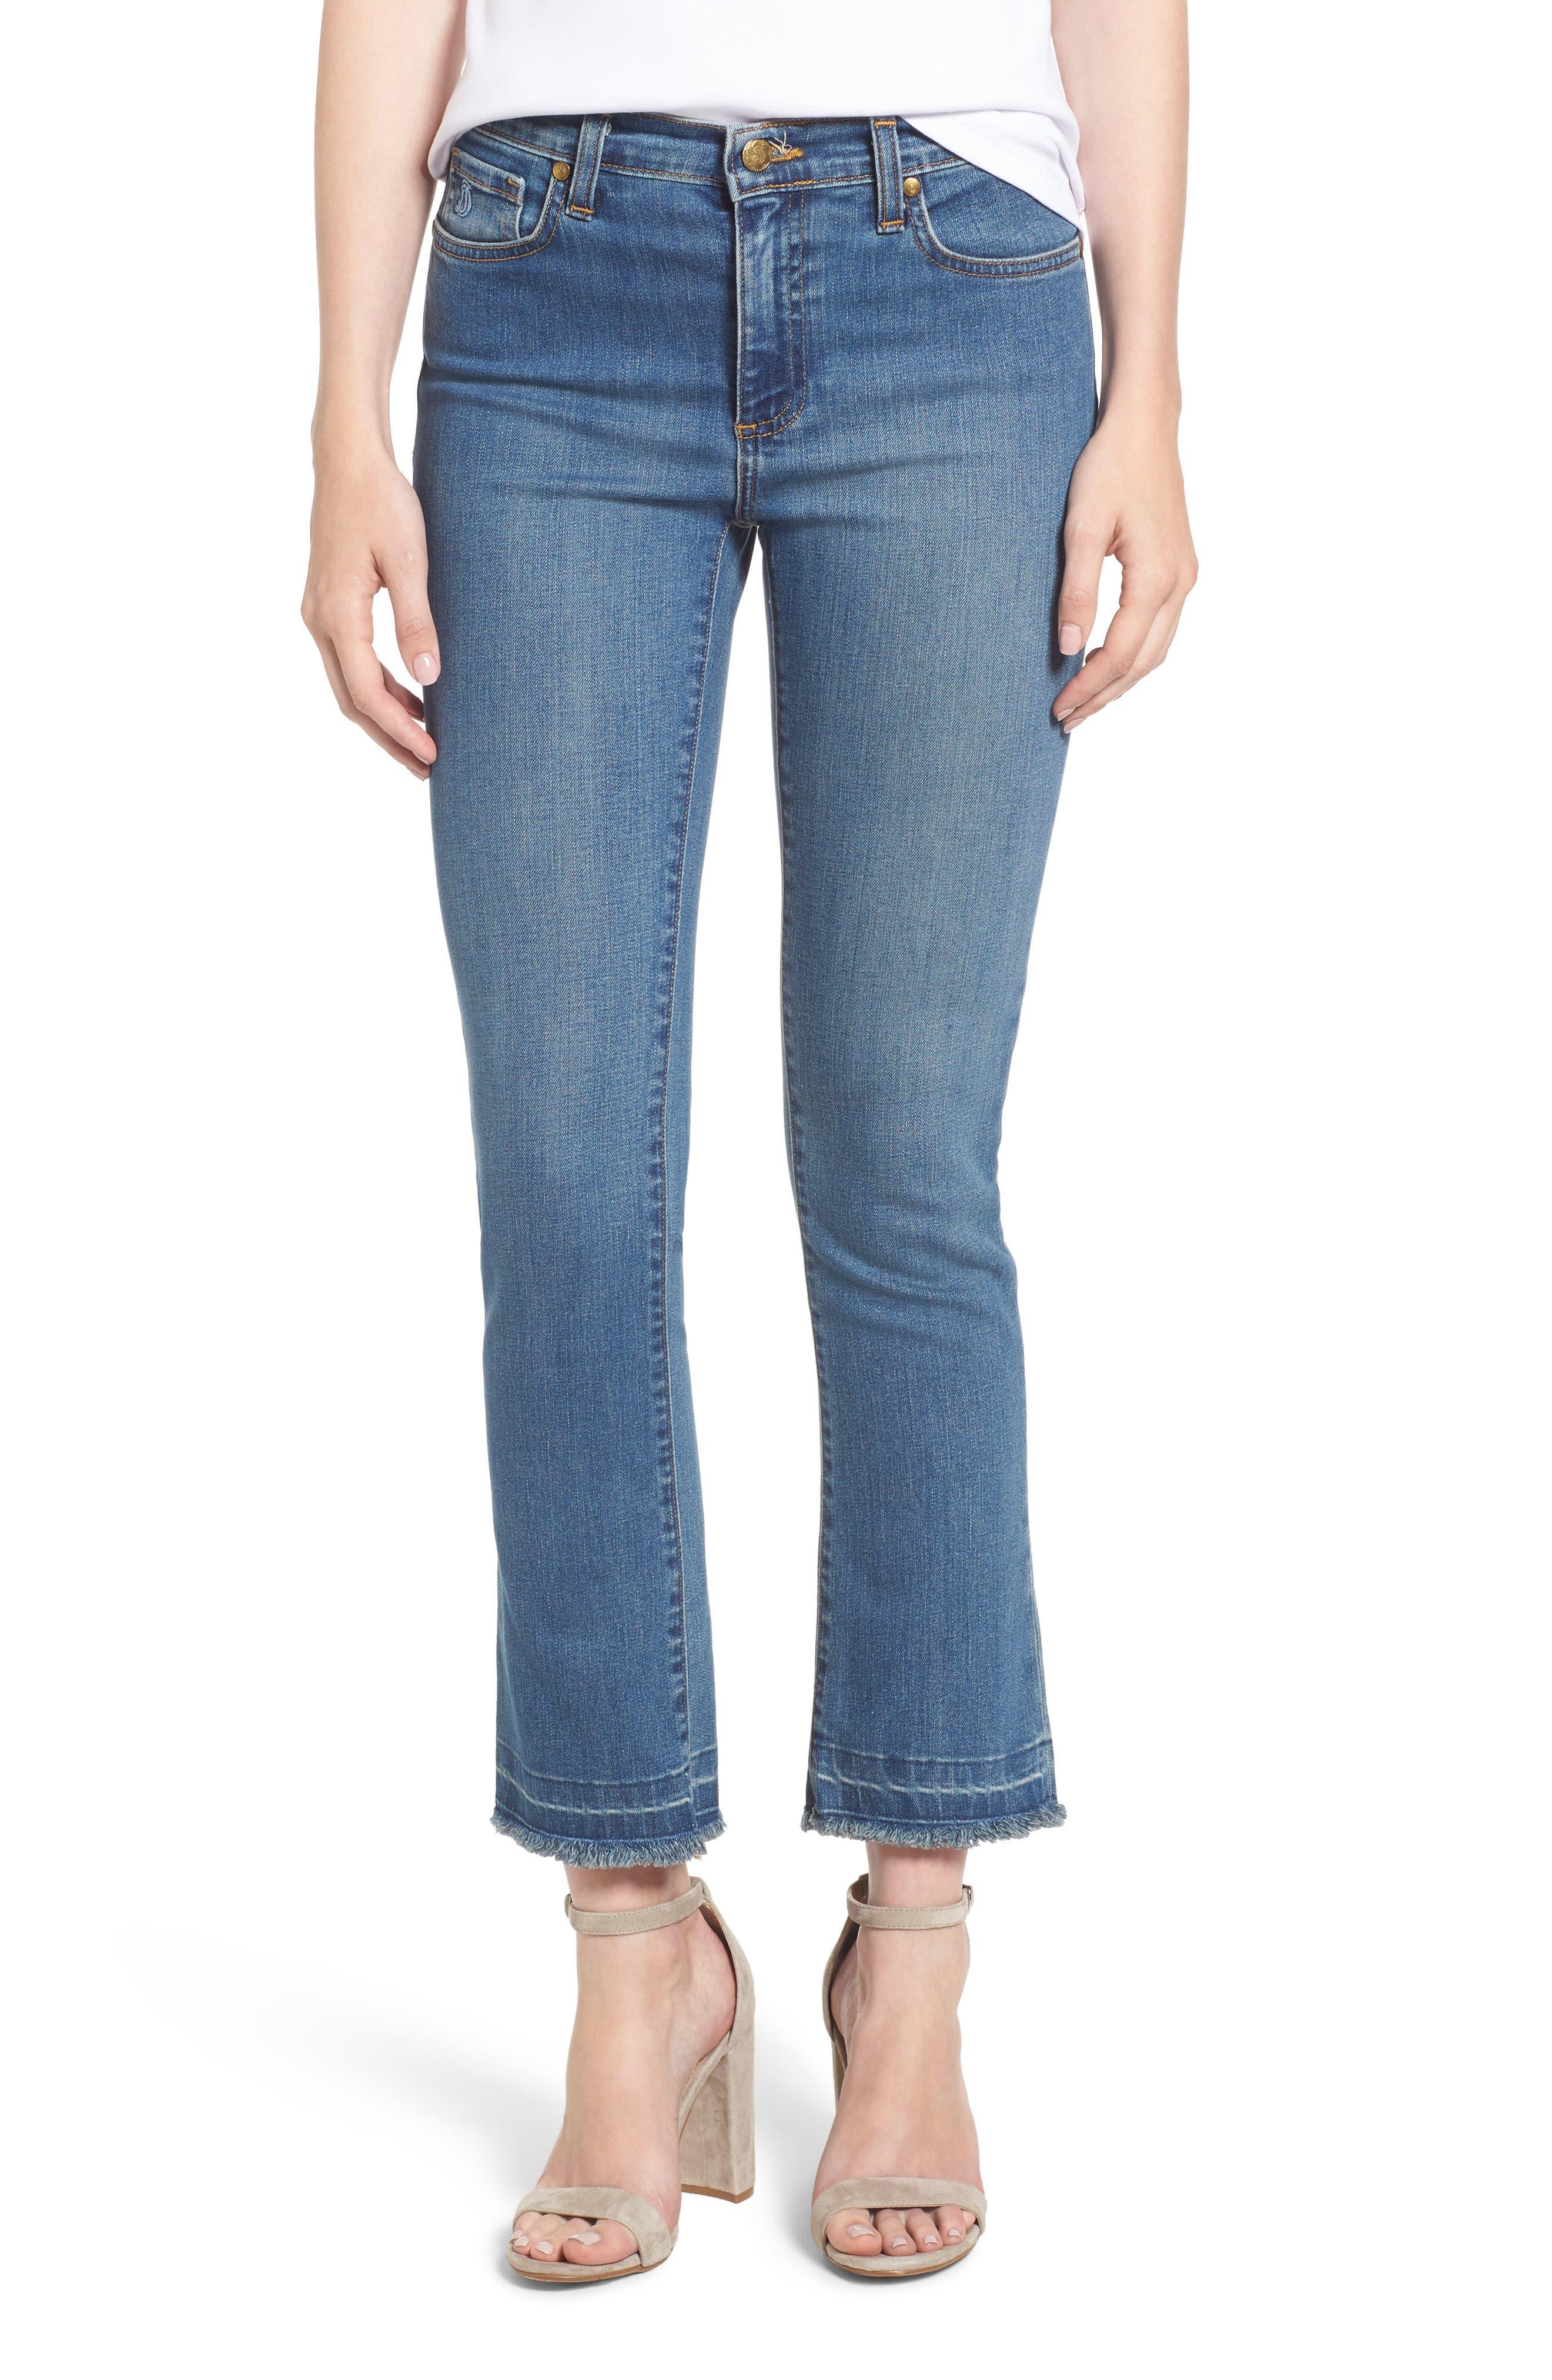 Alternate Image 1 Selected - Draper James Crop Flare Jeans